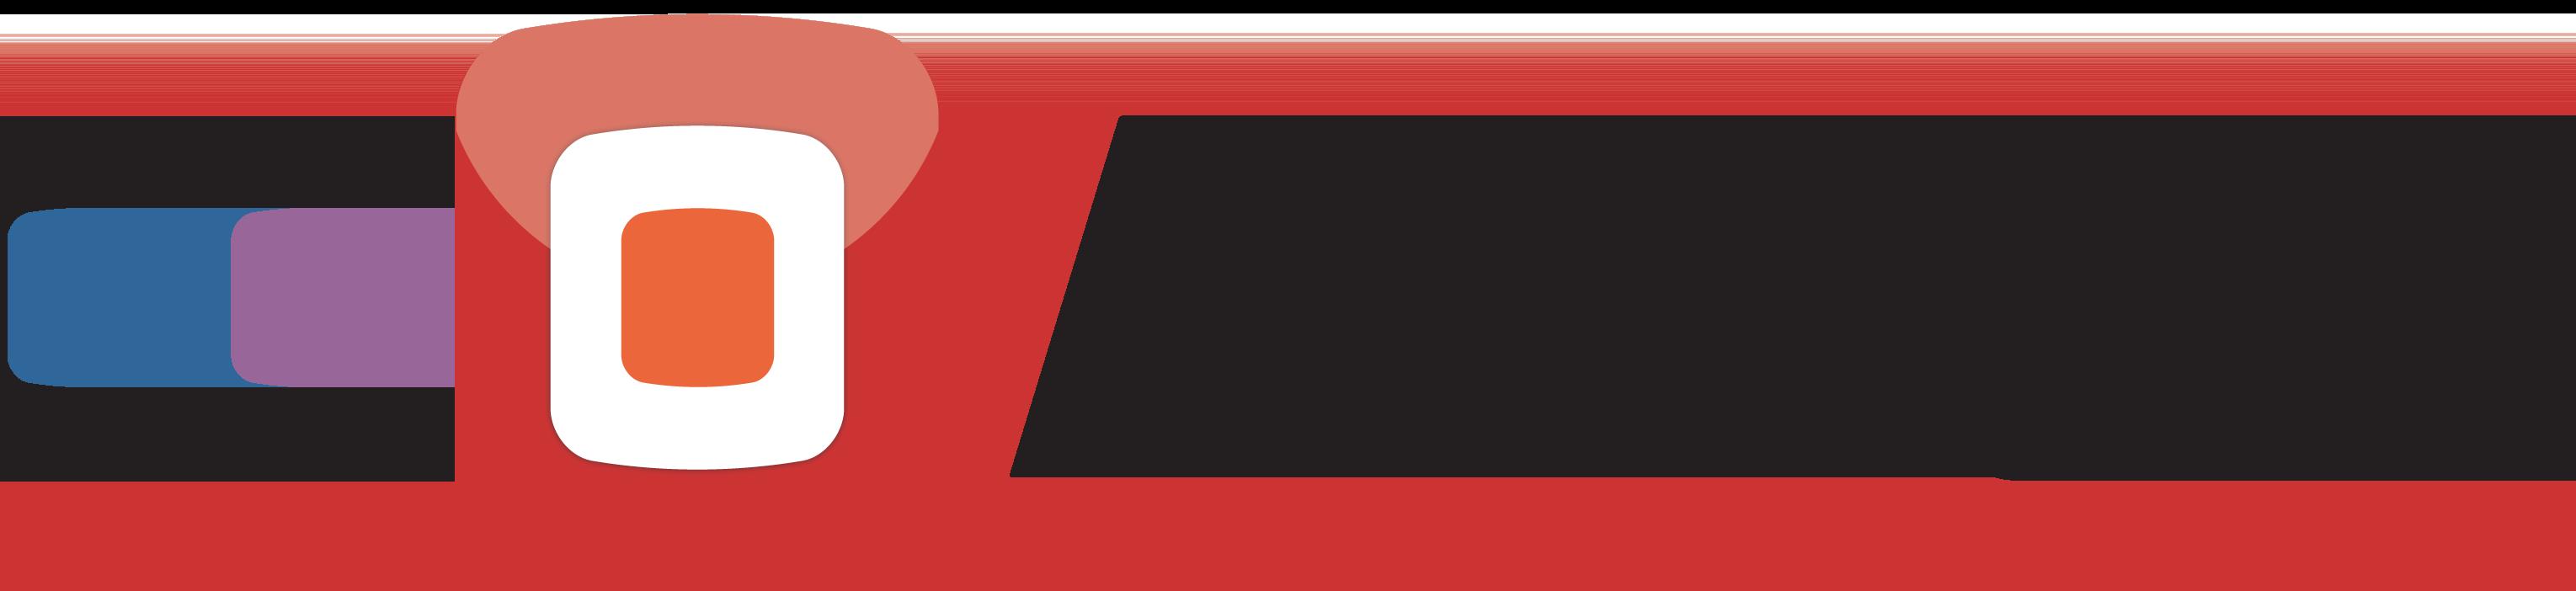 AirKast logo